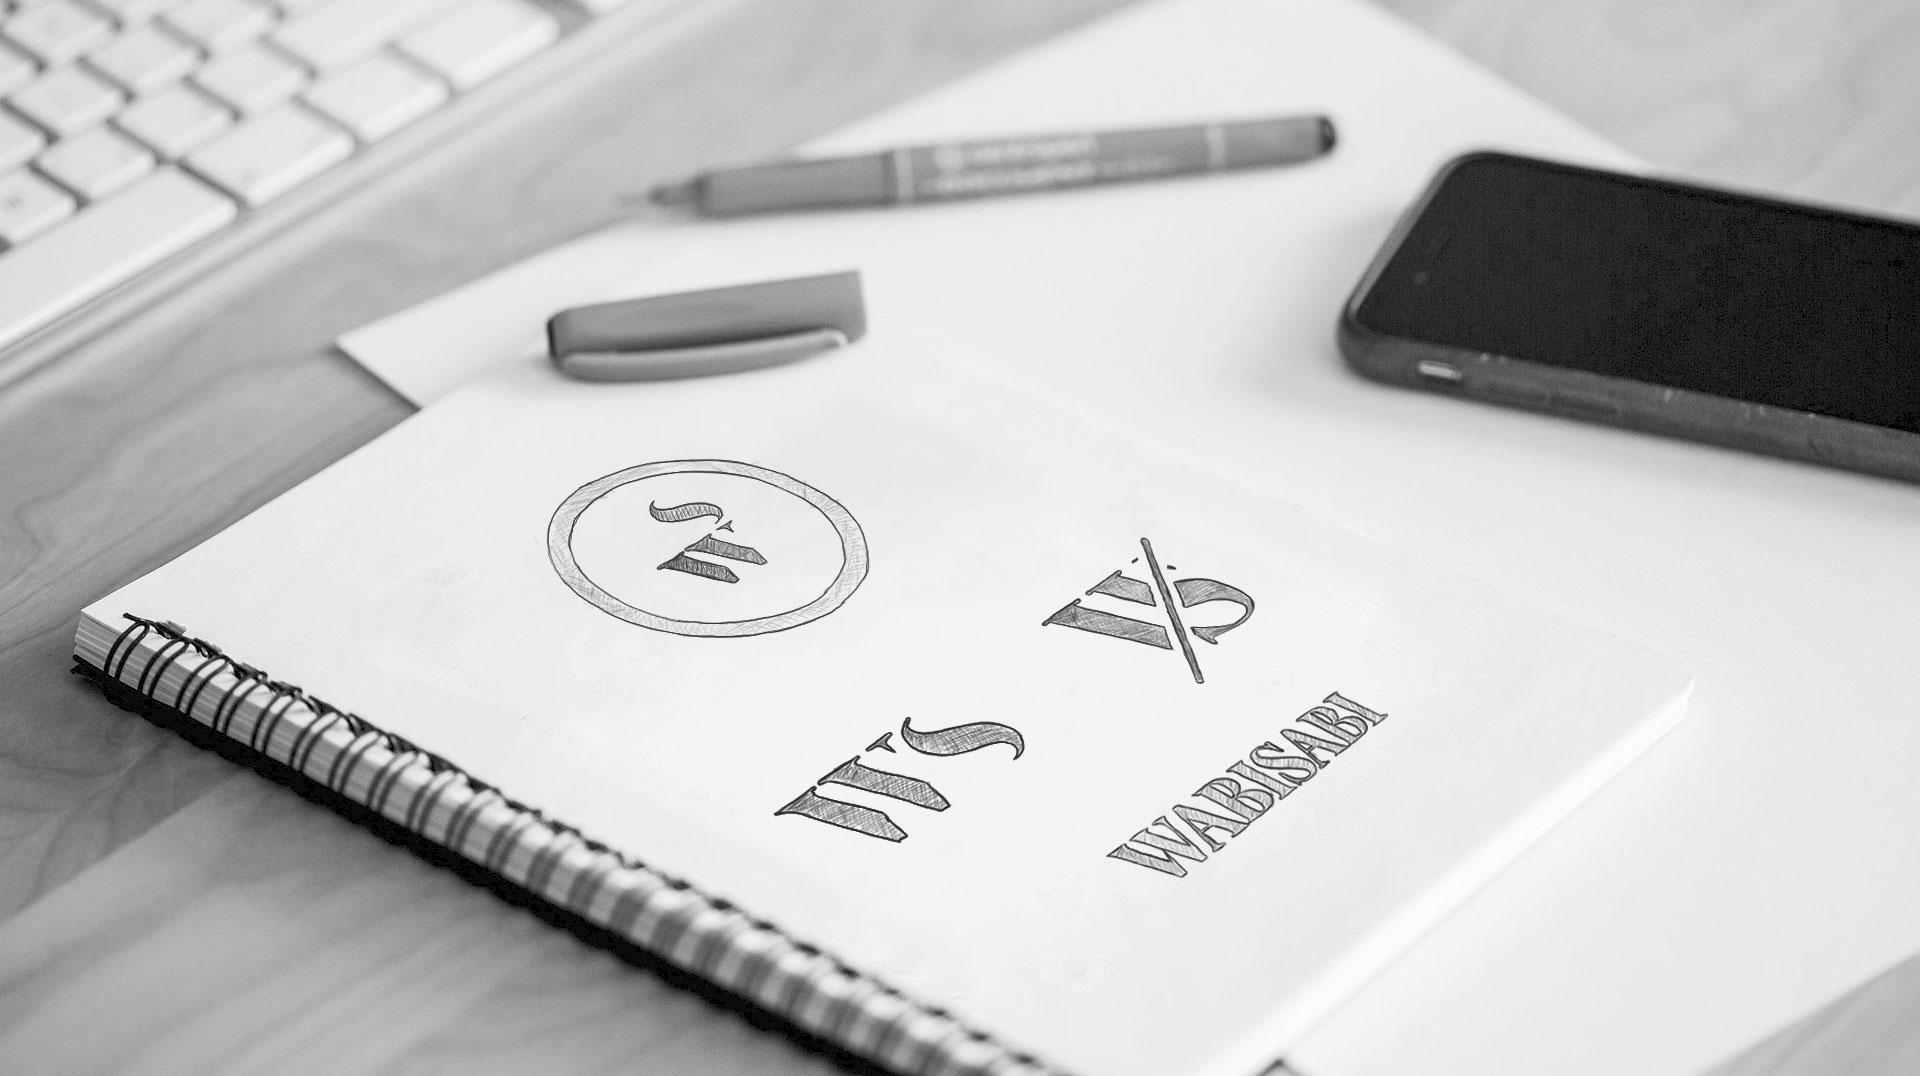 Branding pencil logo sketches interior design סקיצות לוגו מיתוג מעצבת פנים Wabi Sabi